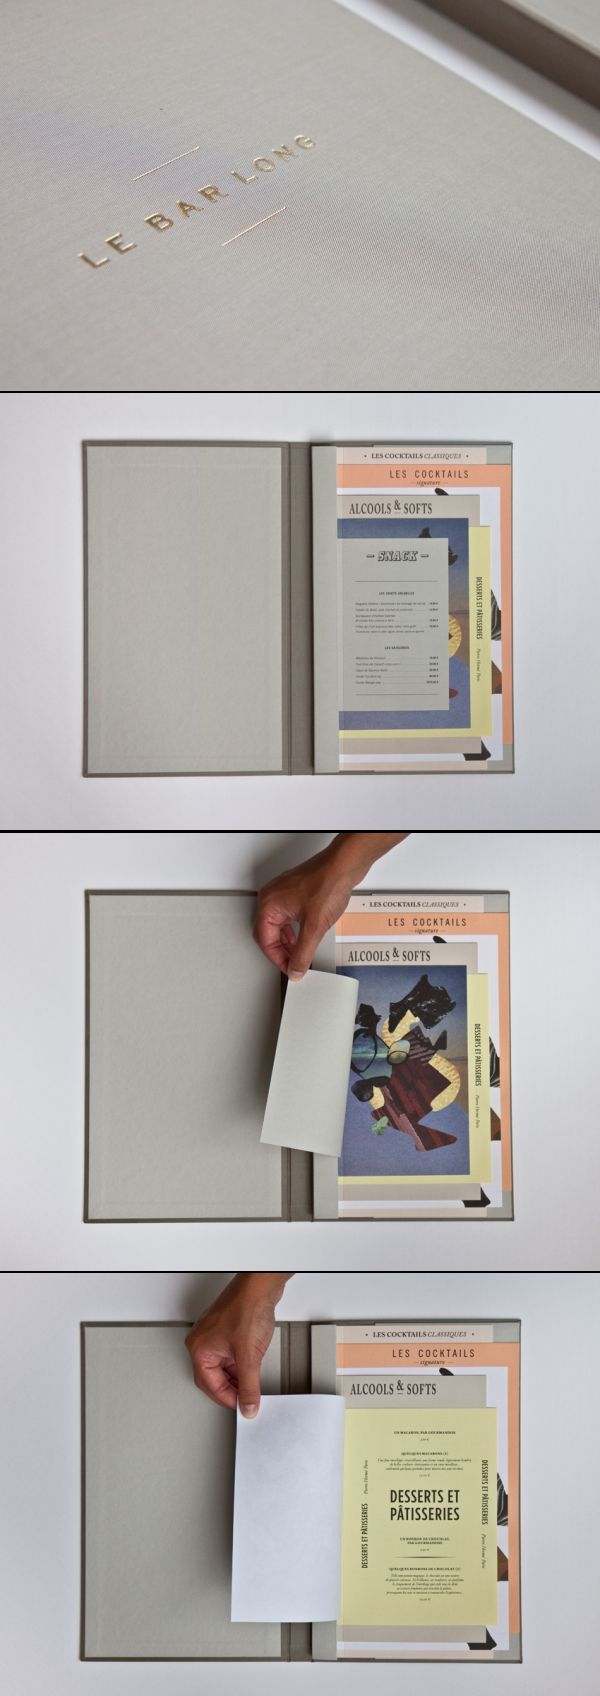 #Design of the bar Le bar long's #menu #graphic design